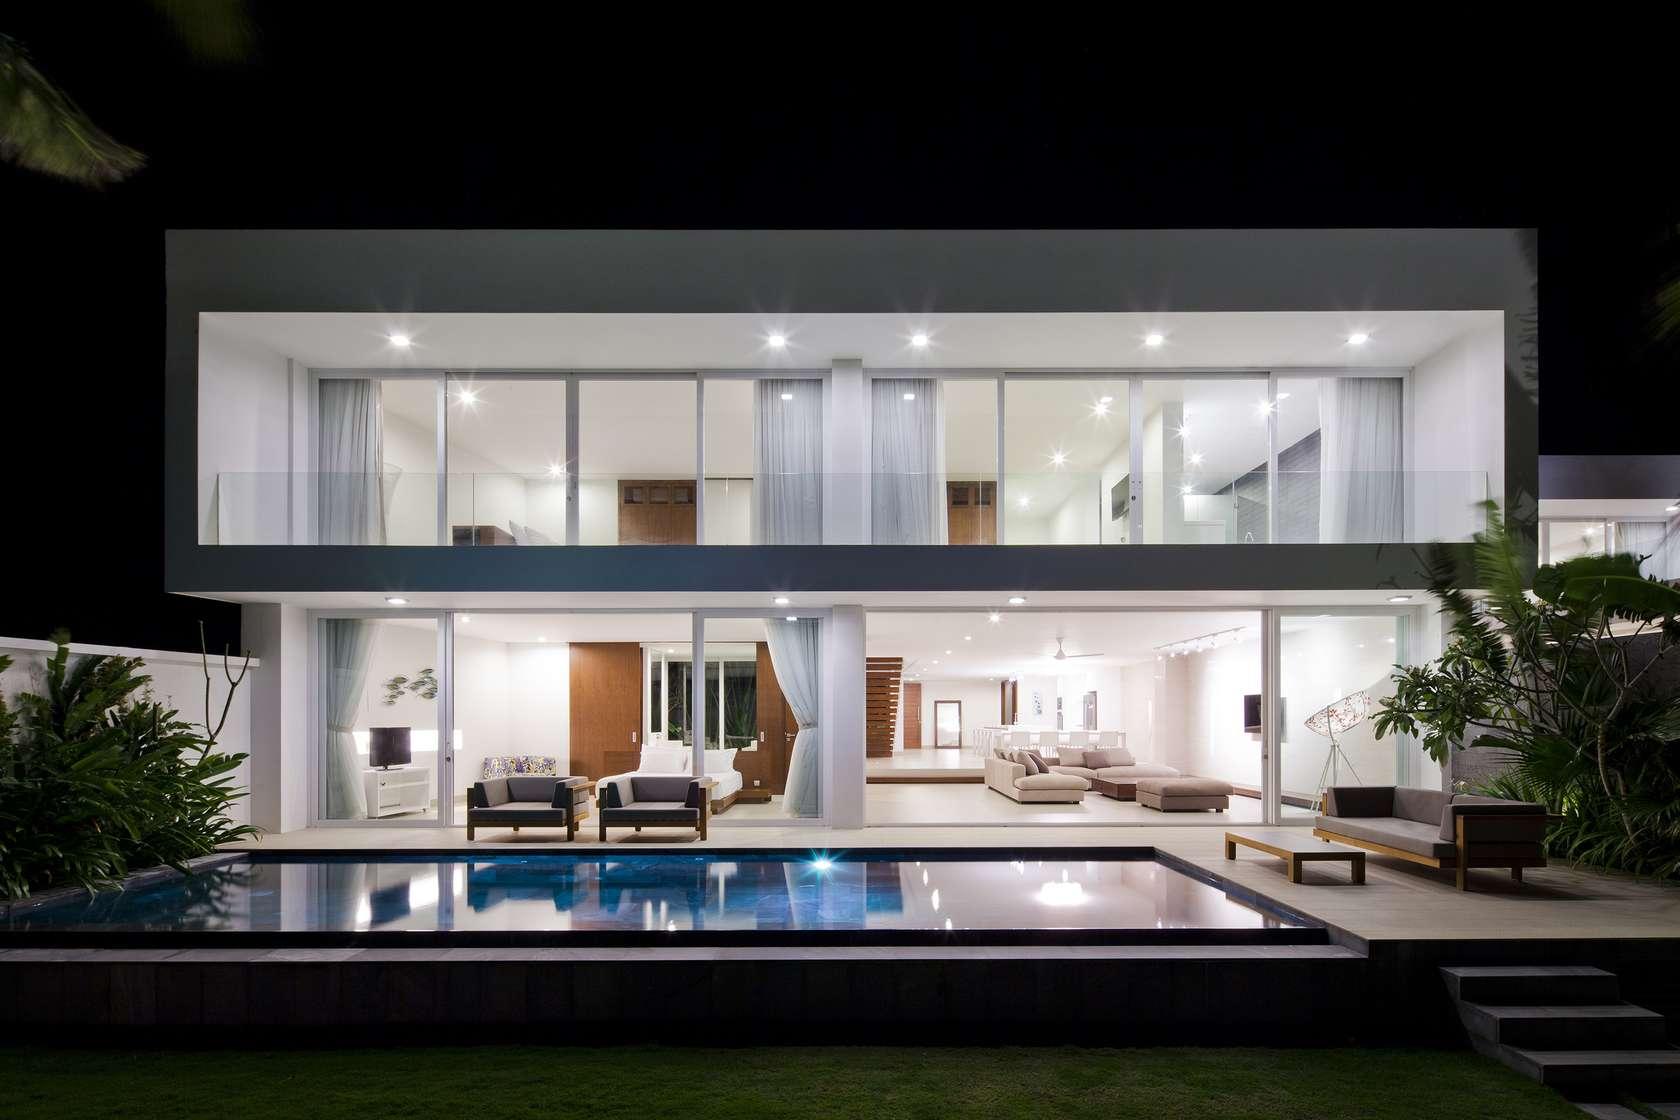 Nighttime beach view private beach villas offer spectacular ocean views and luxurious interiors